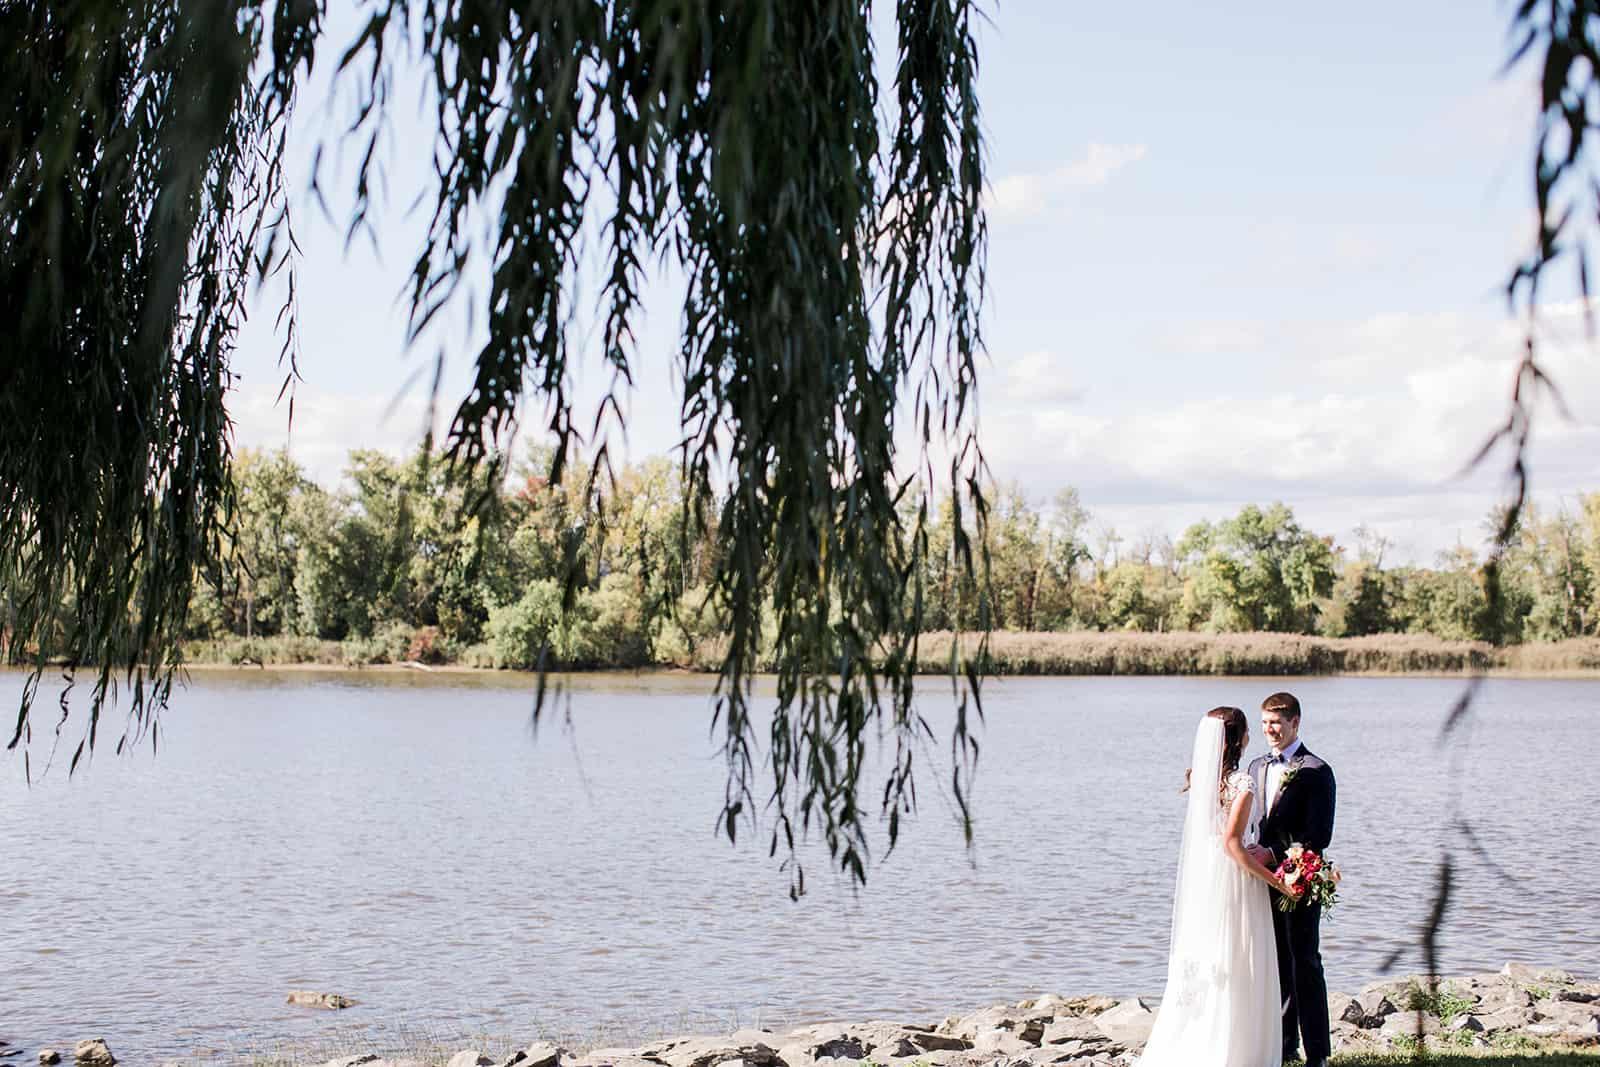 Hudson River wedding ceremony